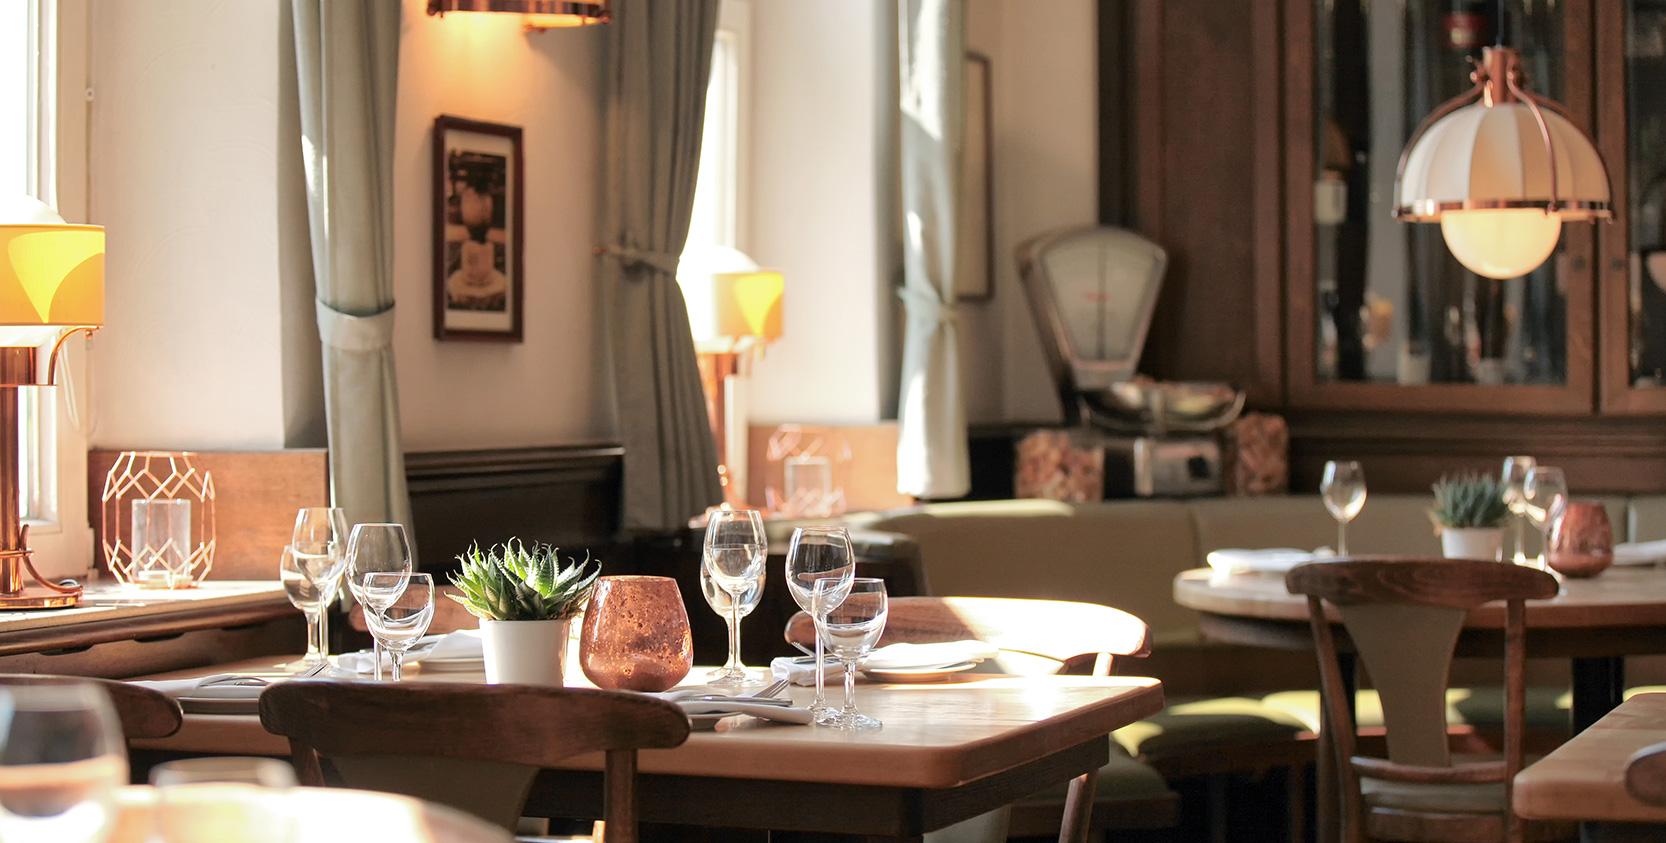 duden-restaurant-04.jpg